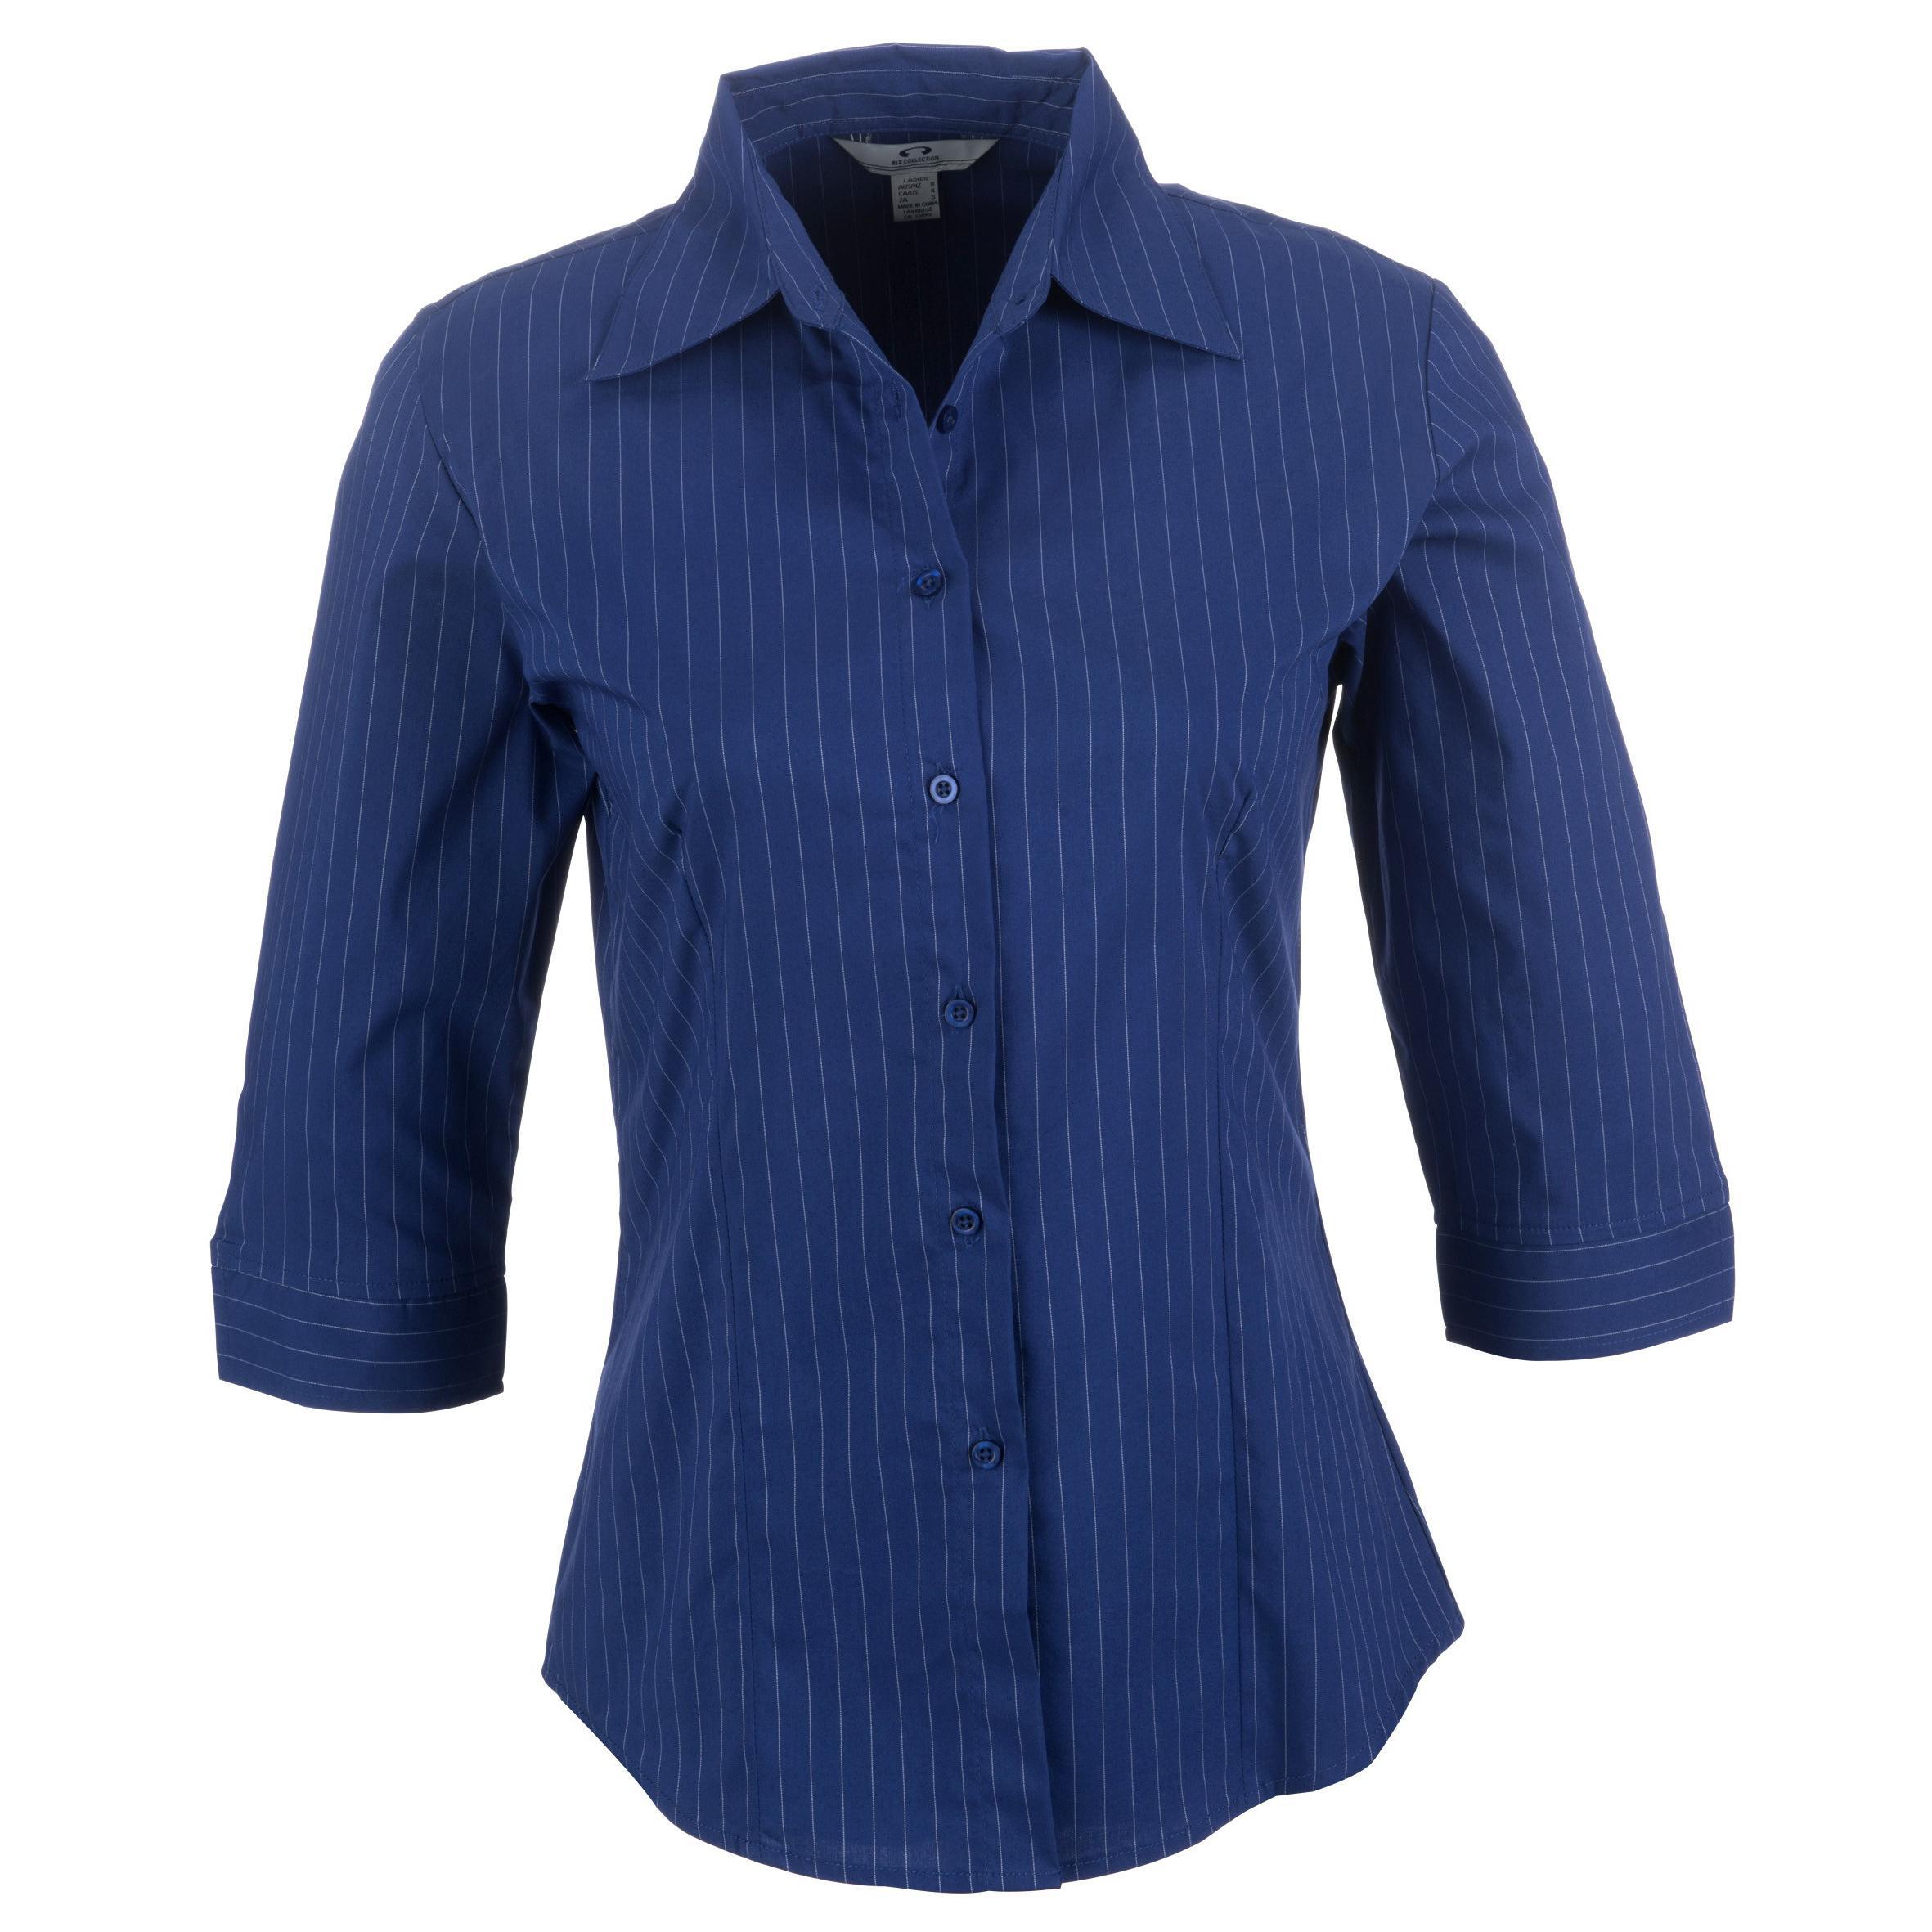 Ladies 3/4 Sleeve Manhattan Striped Shirt - Blue Only